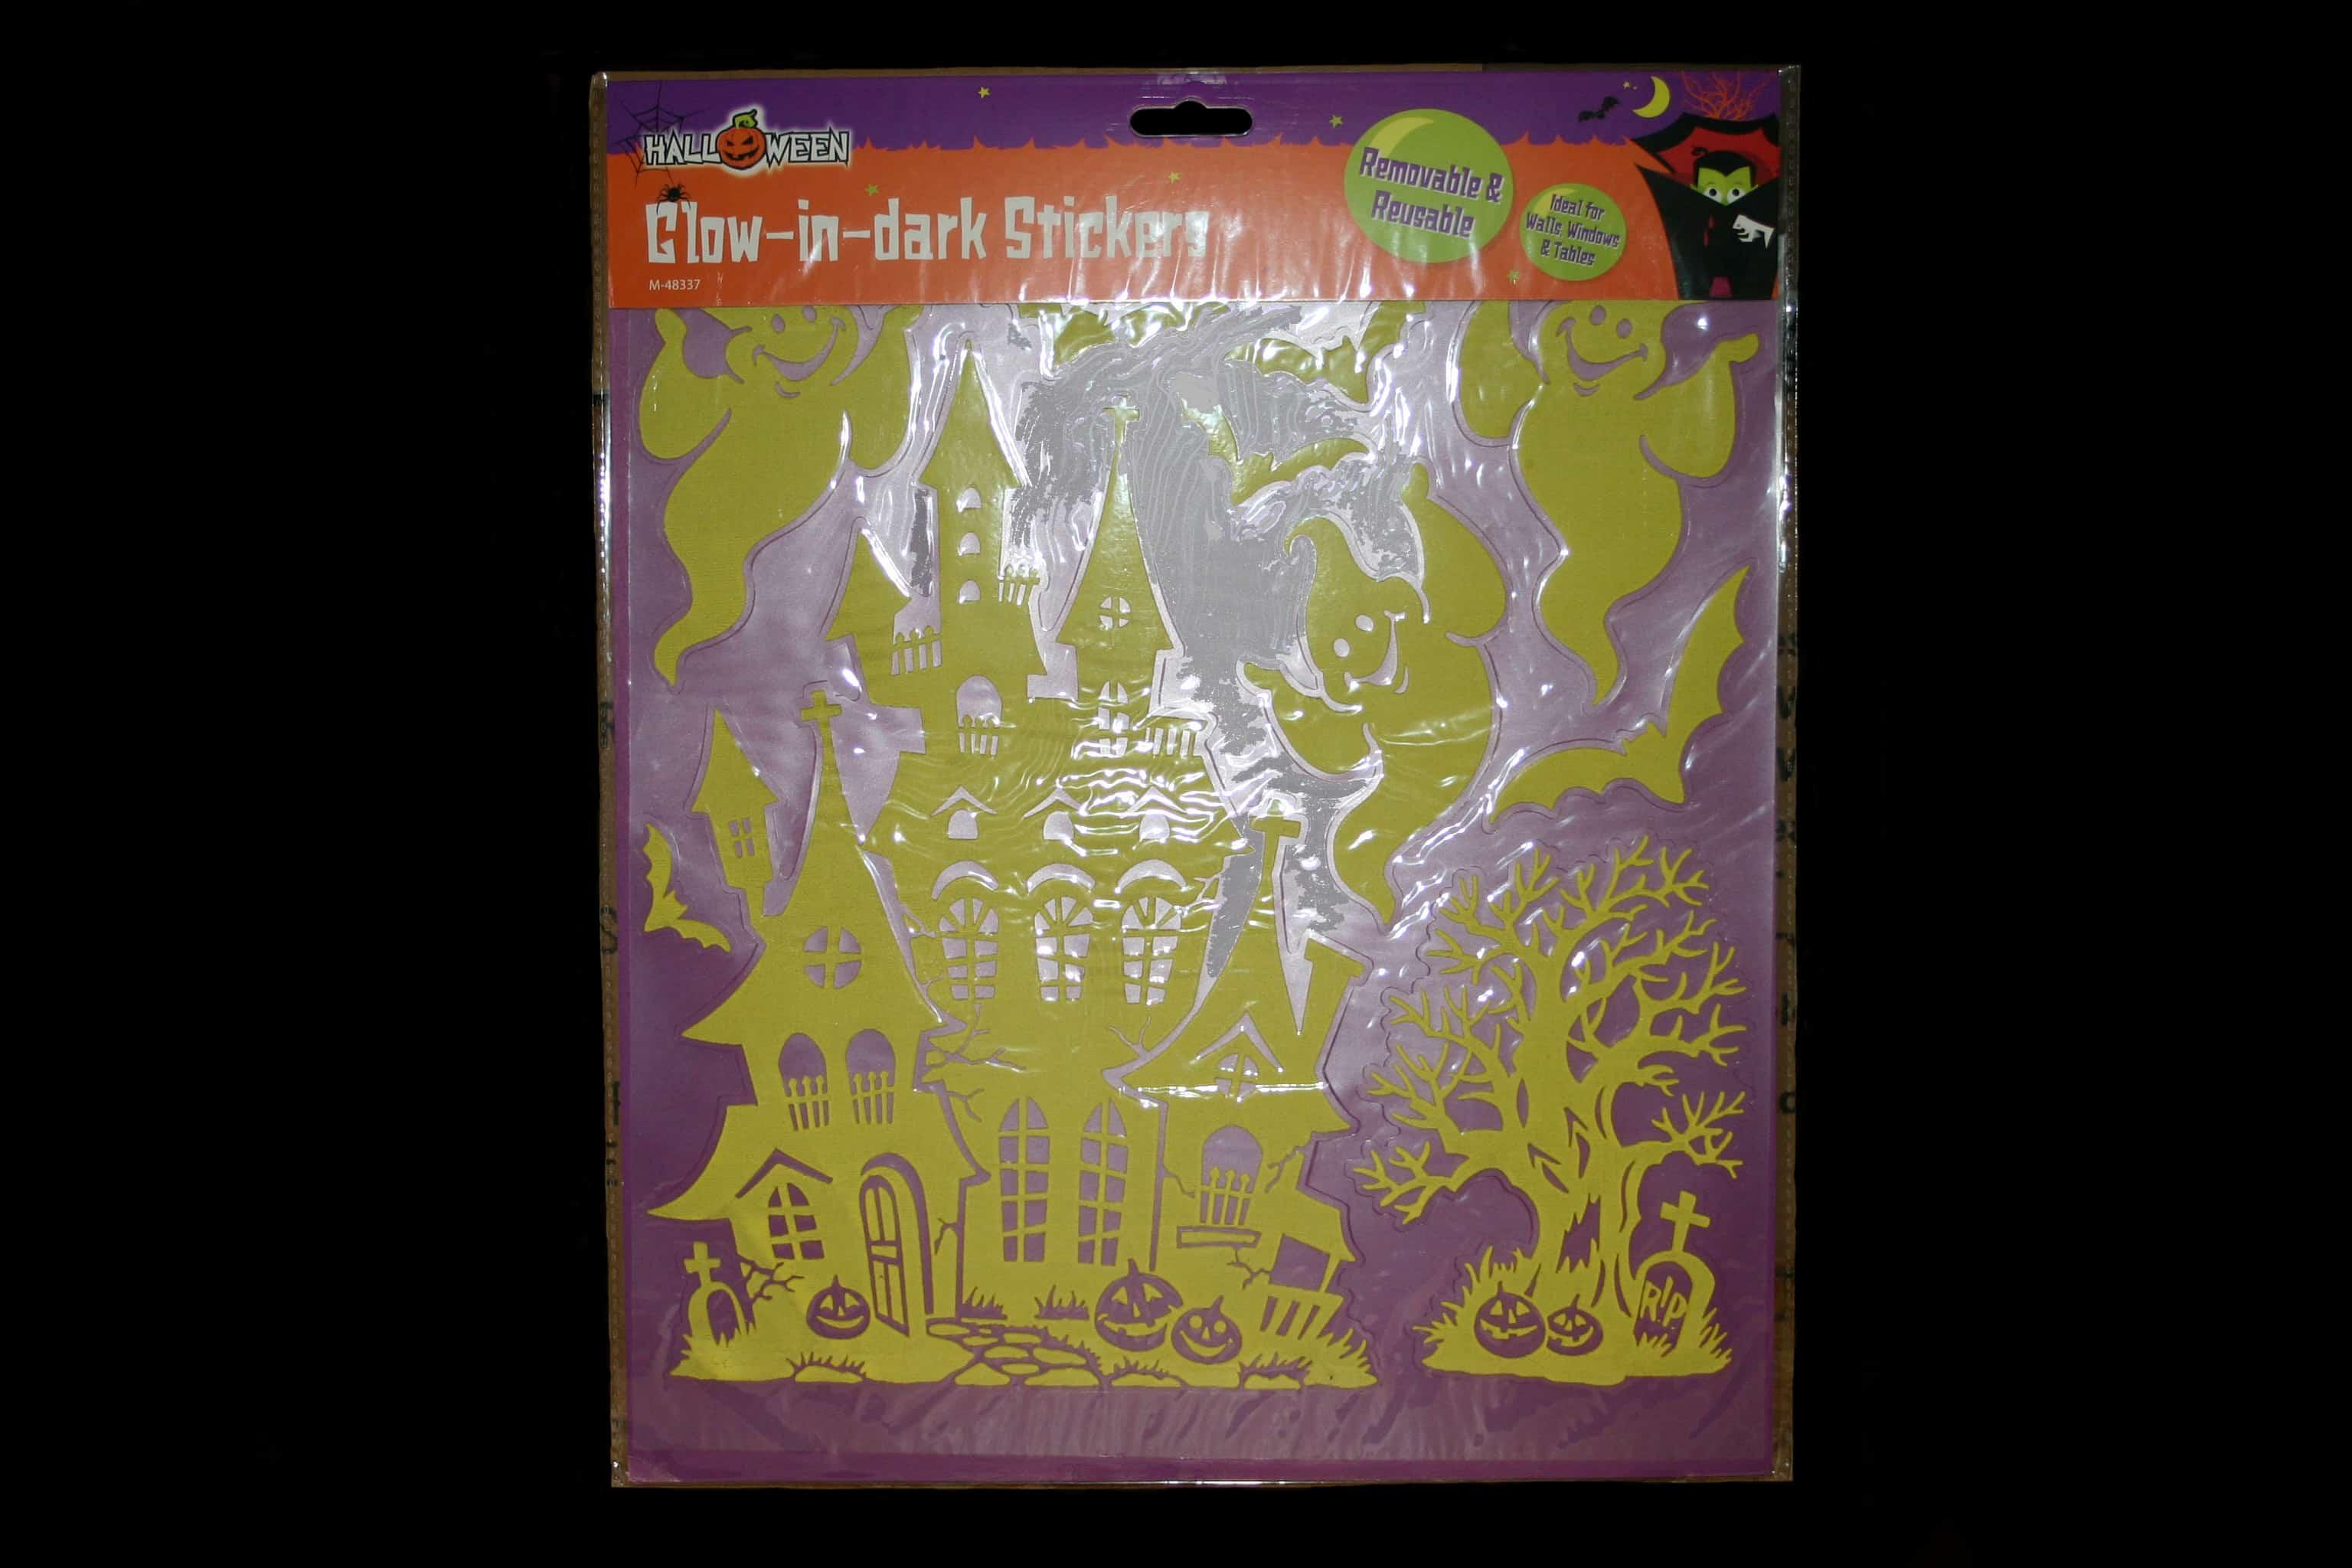 Halloween Glow in the Dark Stickers